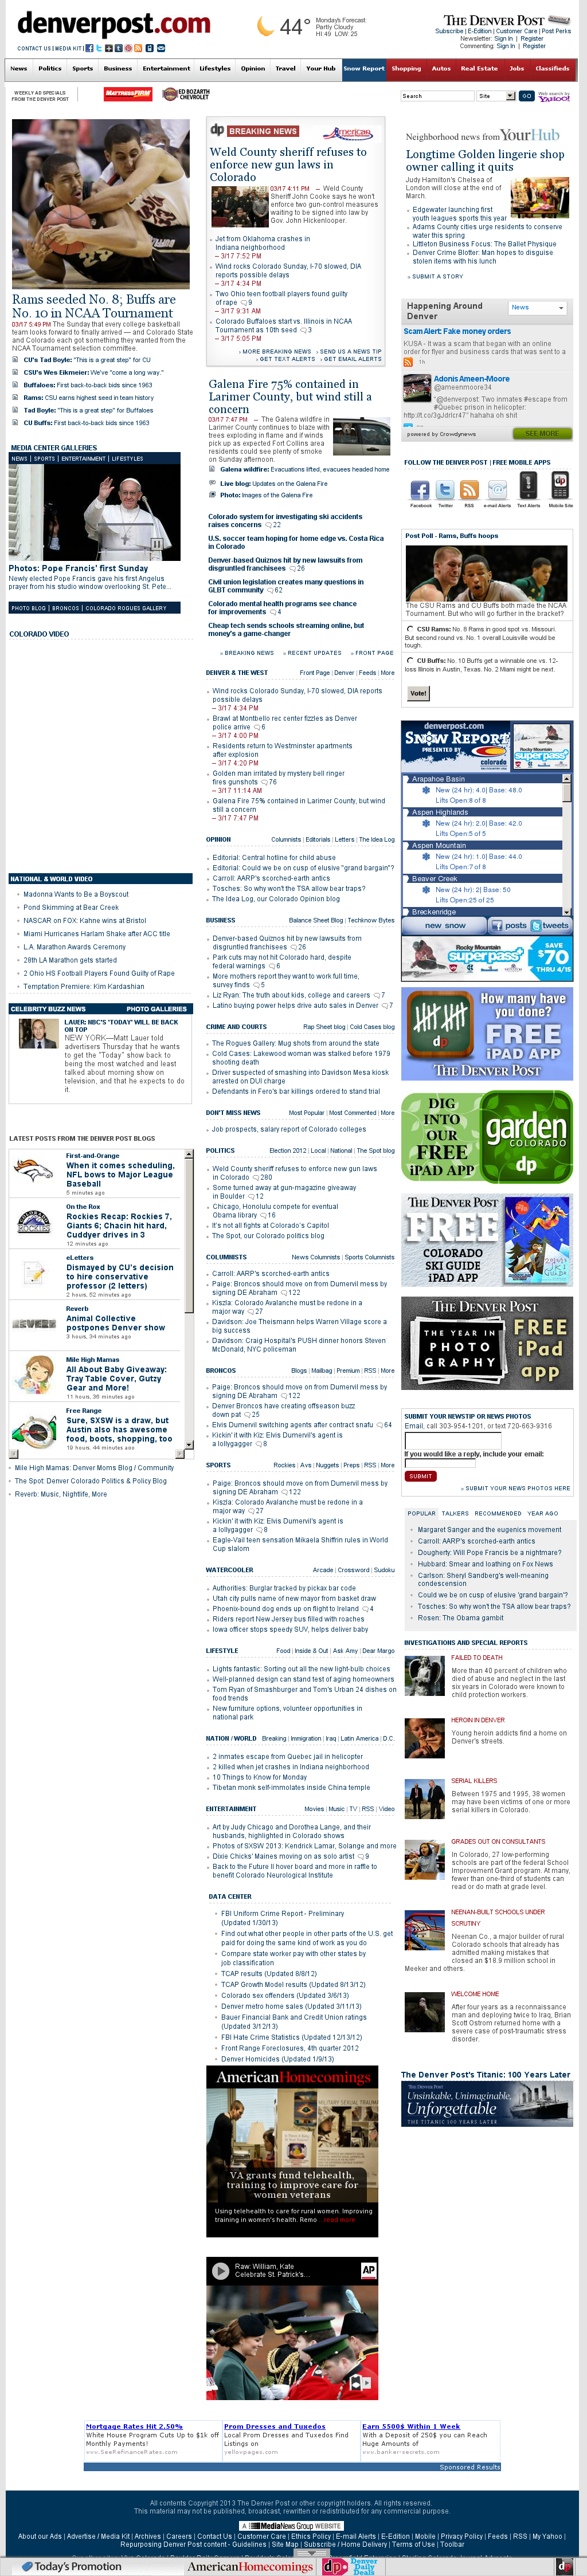 Denver Post at Monday March 18, 2013, 2:06 a.m. UTC